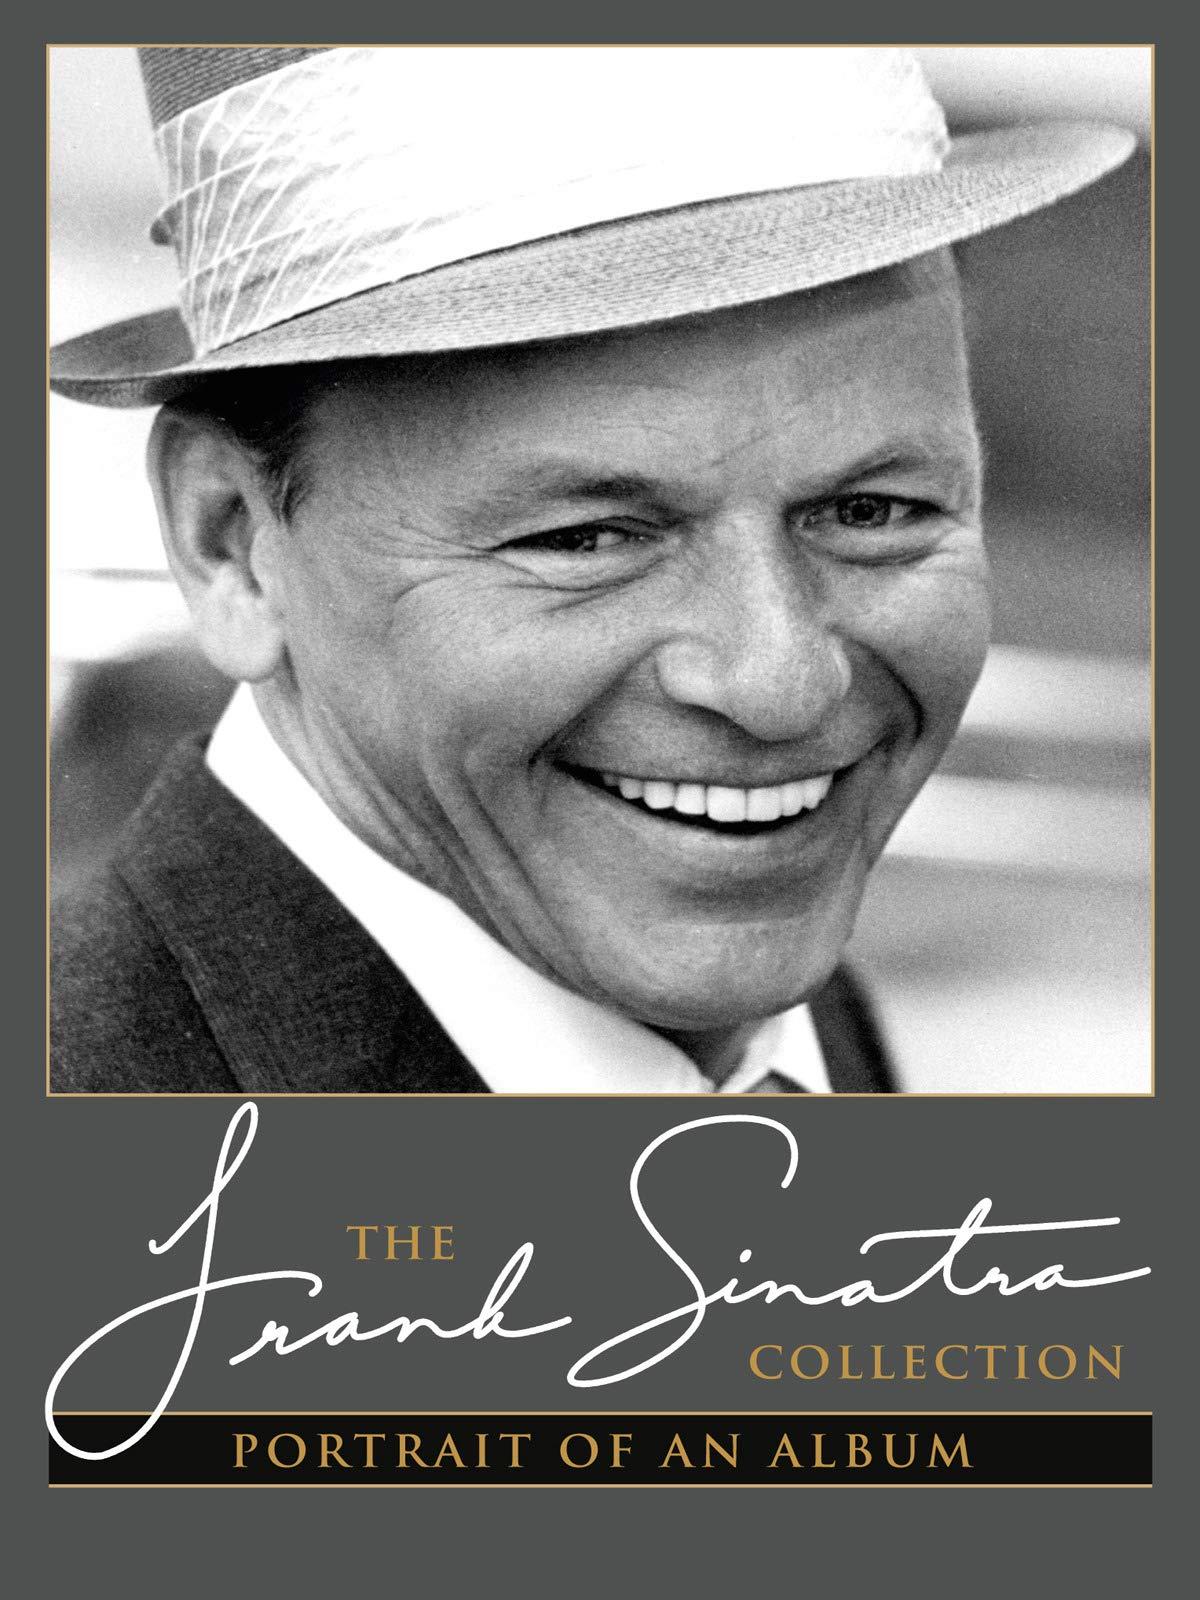 Frank Sinatra - Portrait Of An Album